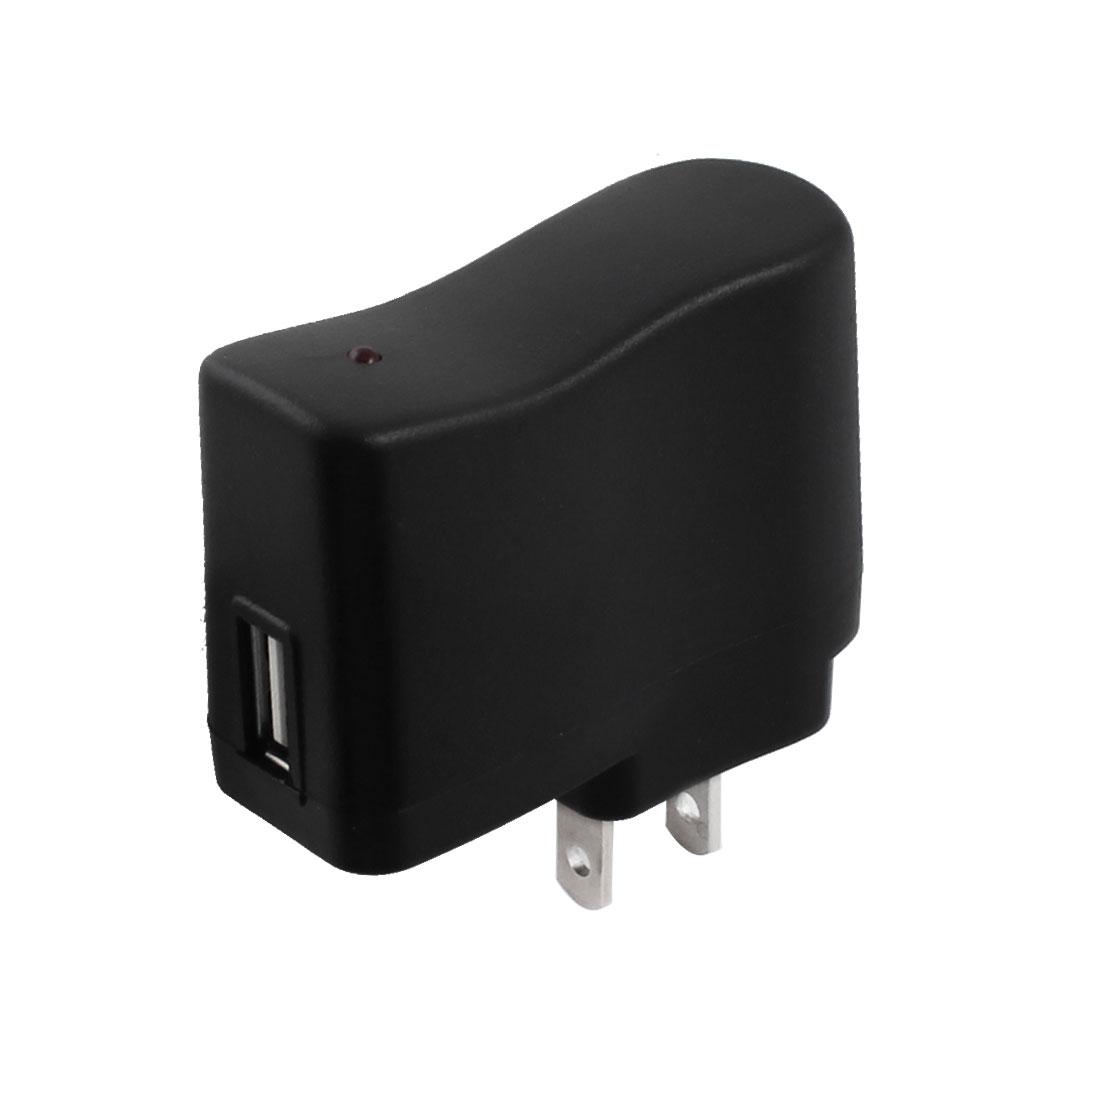 US Plug to USB Female Socket AC 110-240V DC 5V Power Converter Adapter